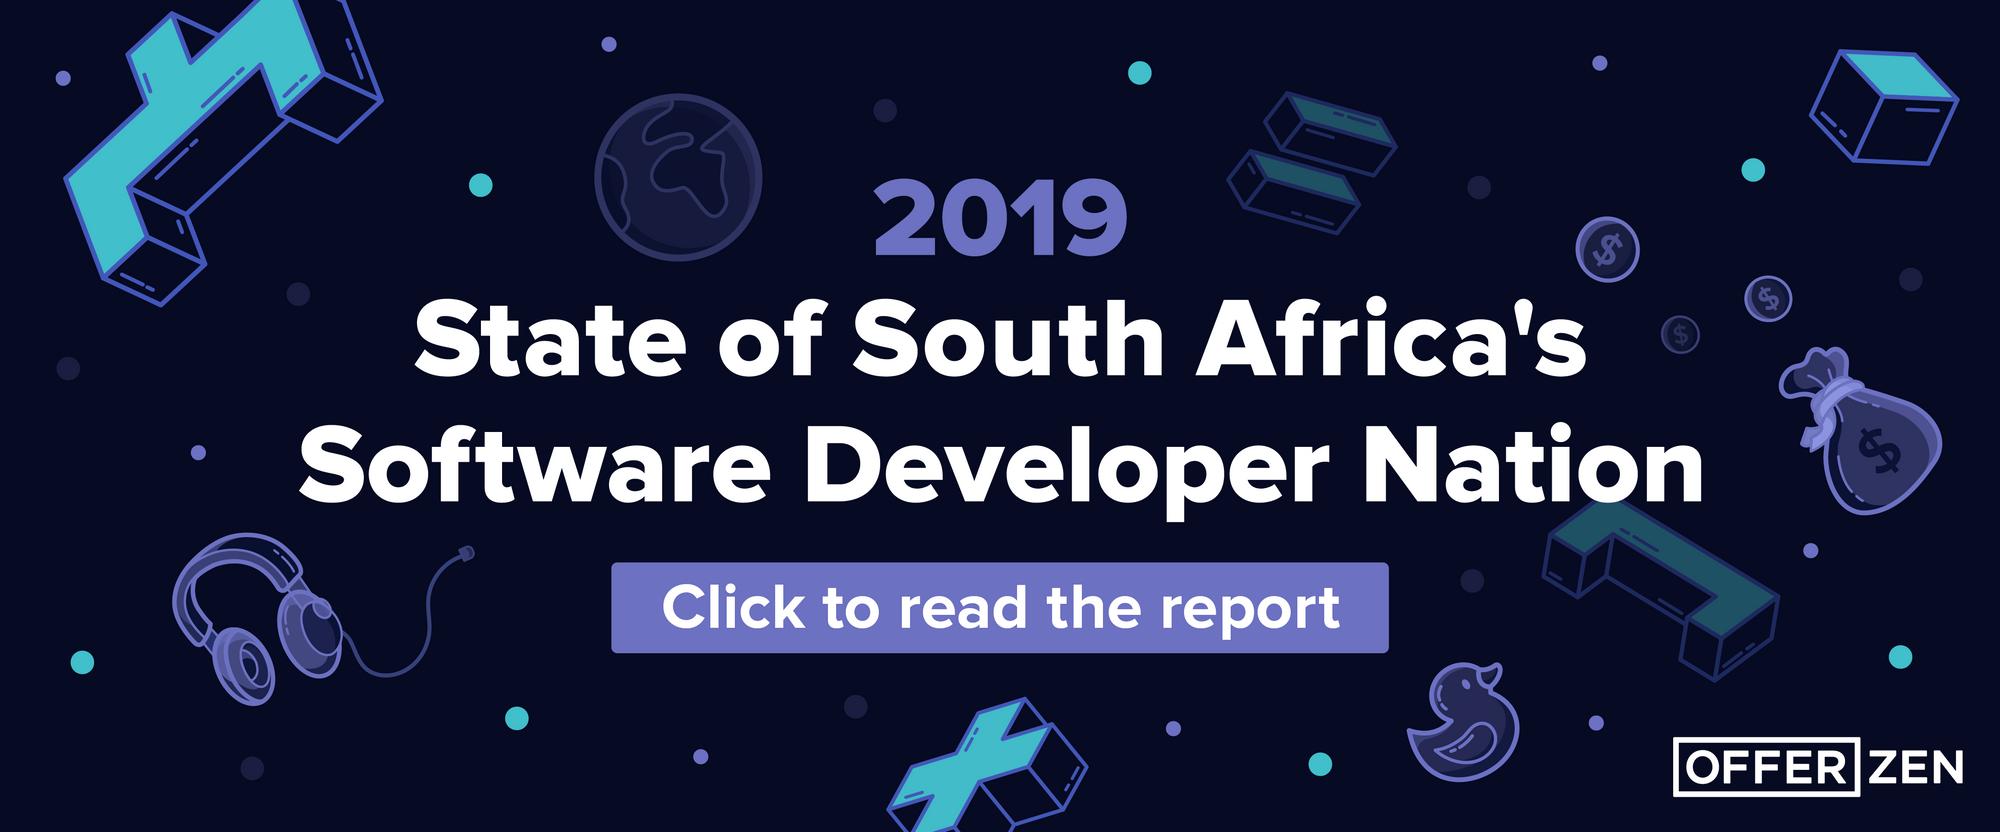 2019-State-of-South-Africa-s-Software-Developer-Nation_Inner-blog-image